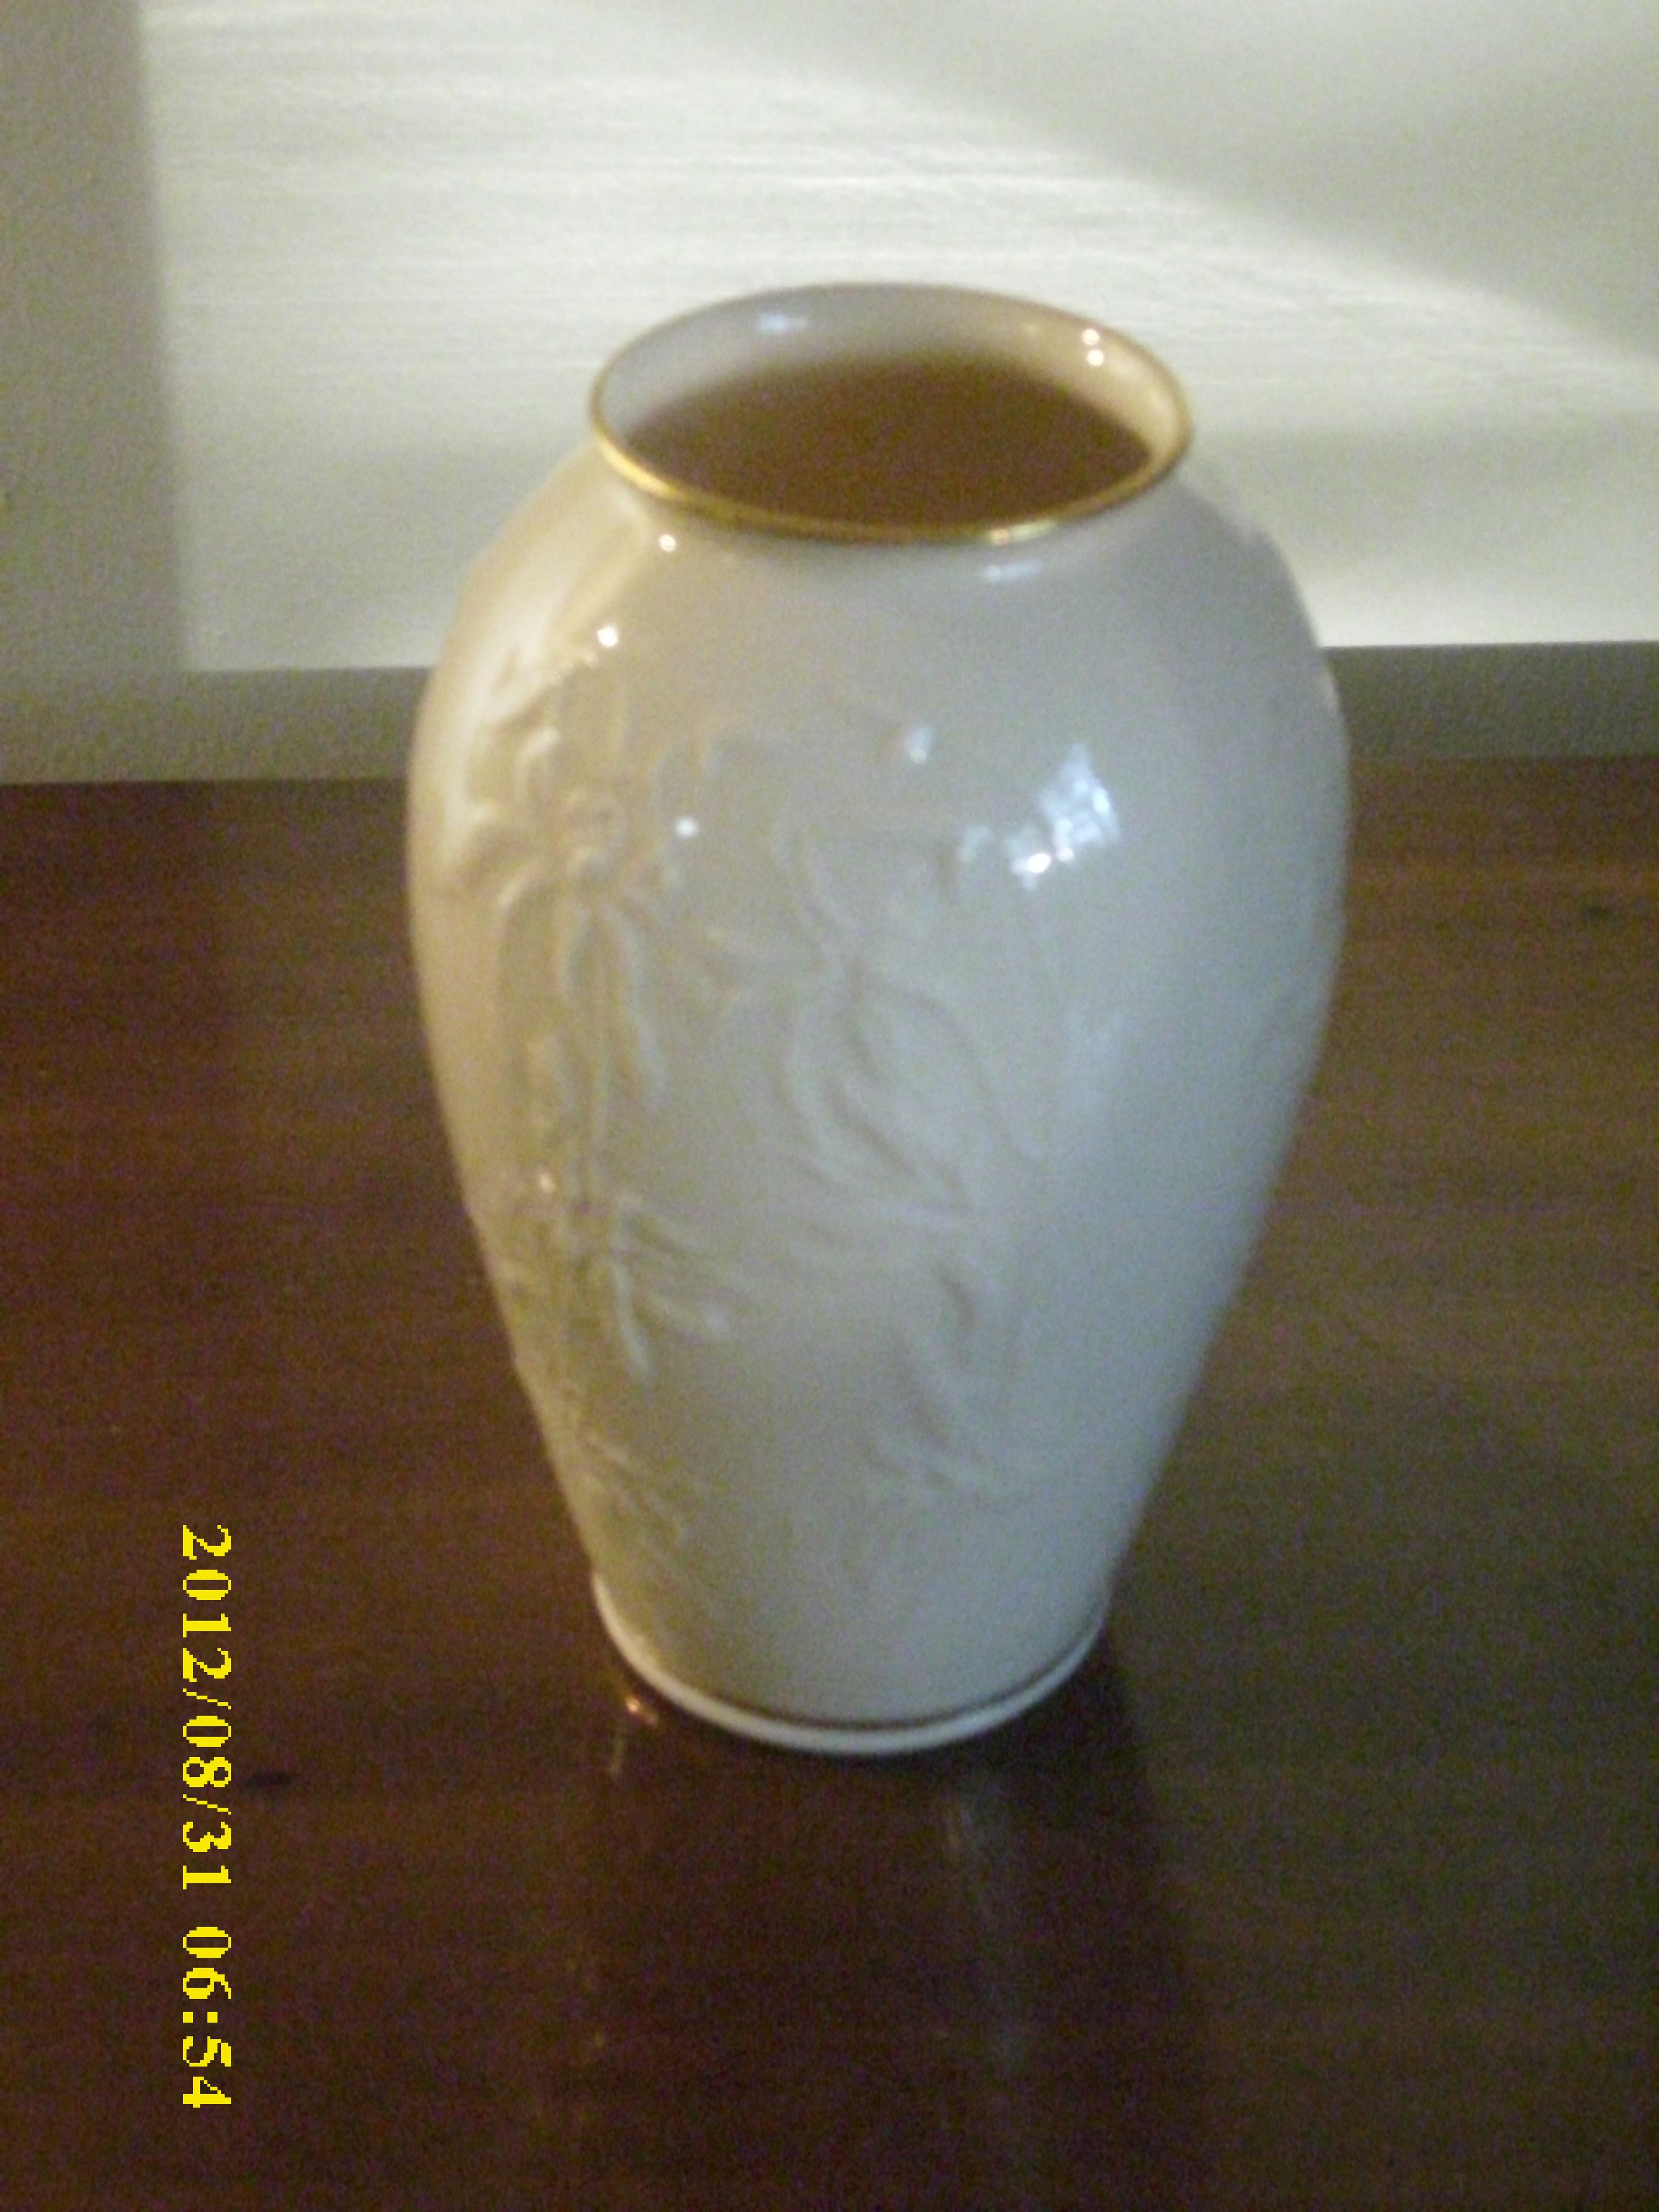 Lenox 1964 Lenox Ivory Procrlian Carved Bone China W 24k Gold Trim 3 Pieces Lenox Vase Gold Trim Carving